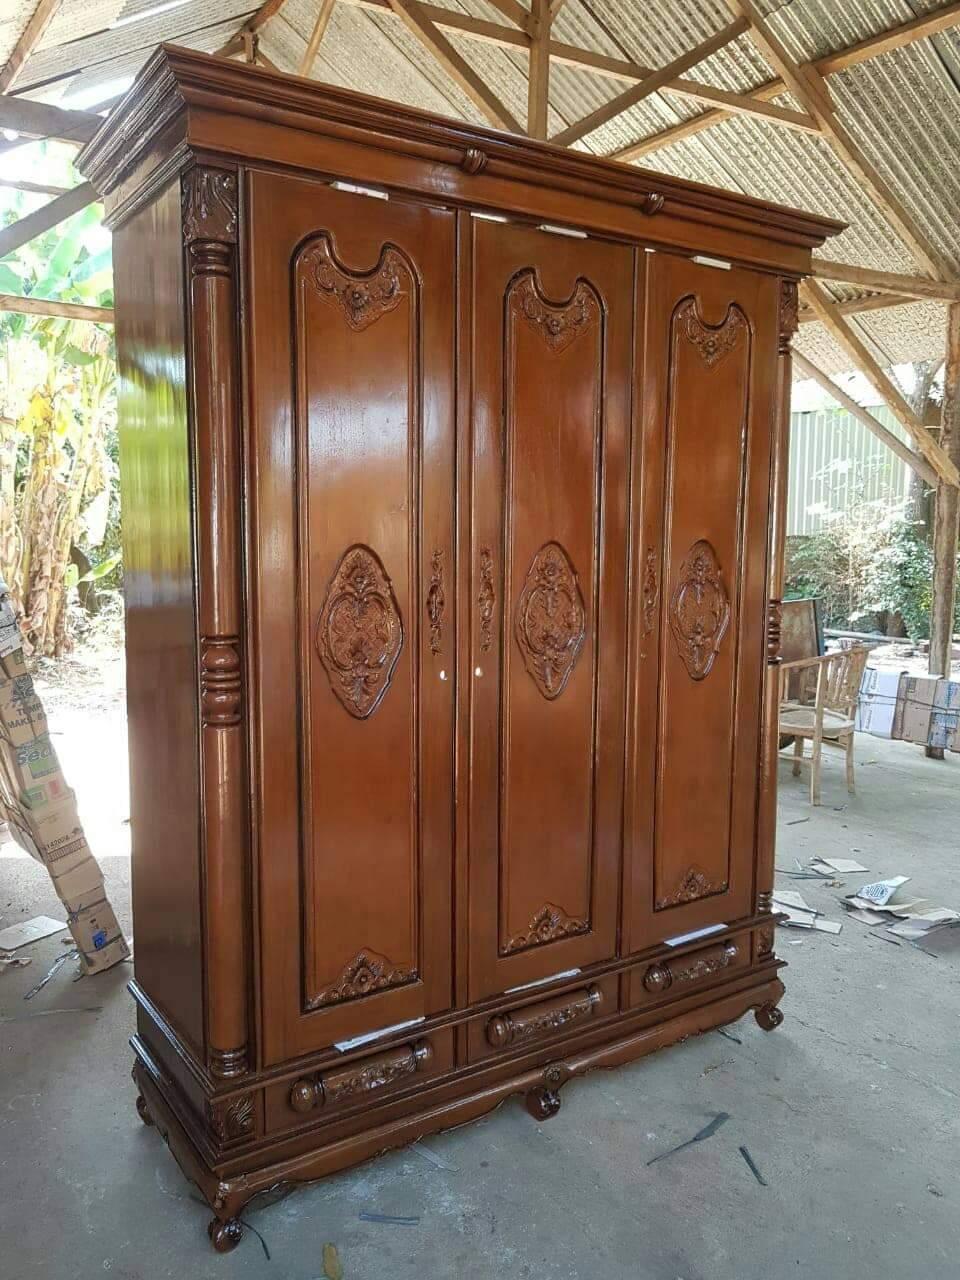 Lemari pakaian 3 pintu kayu jati ukir Jepara